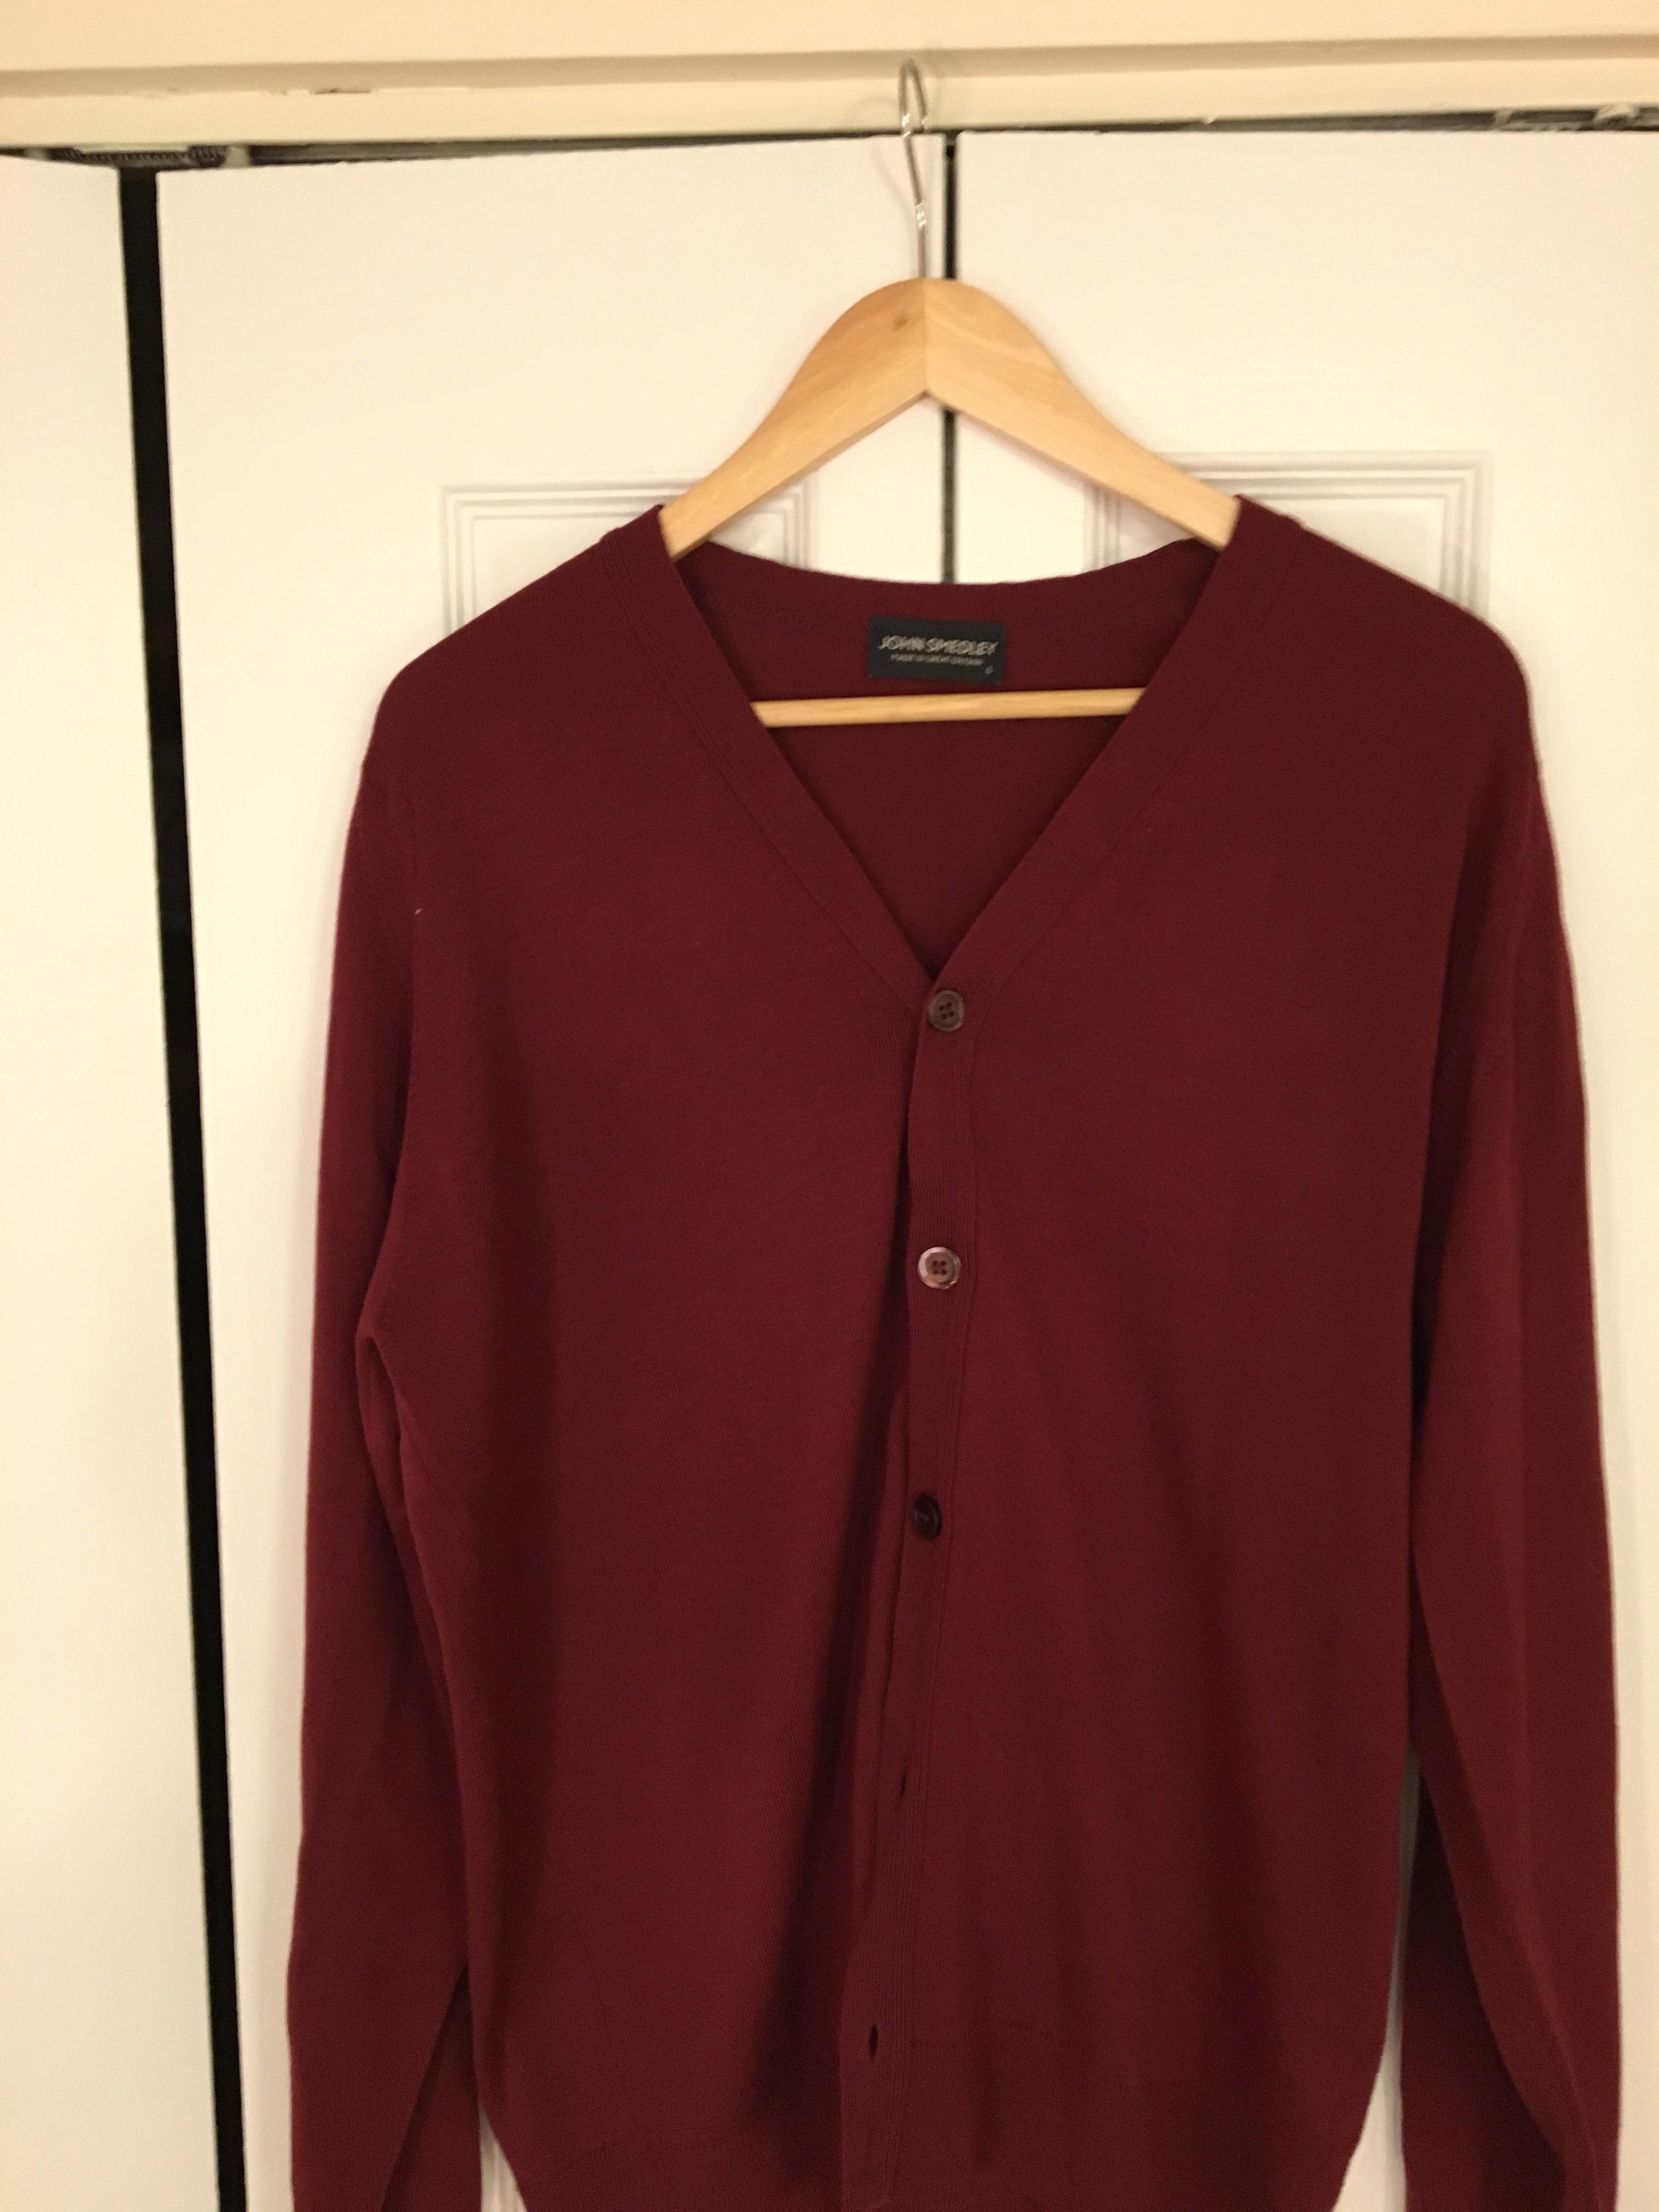 e7b92ff2721 John Smedley Red John Smedley Whitchurch Cardigan Size l - Sweaters ...